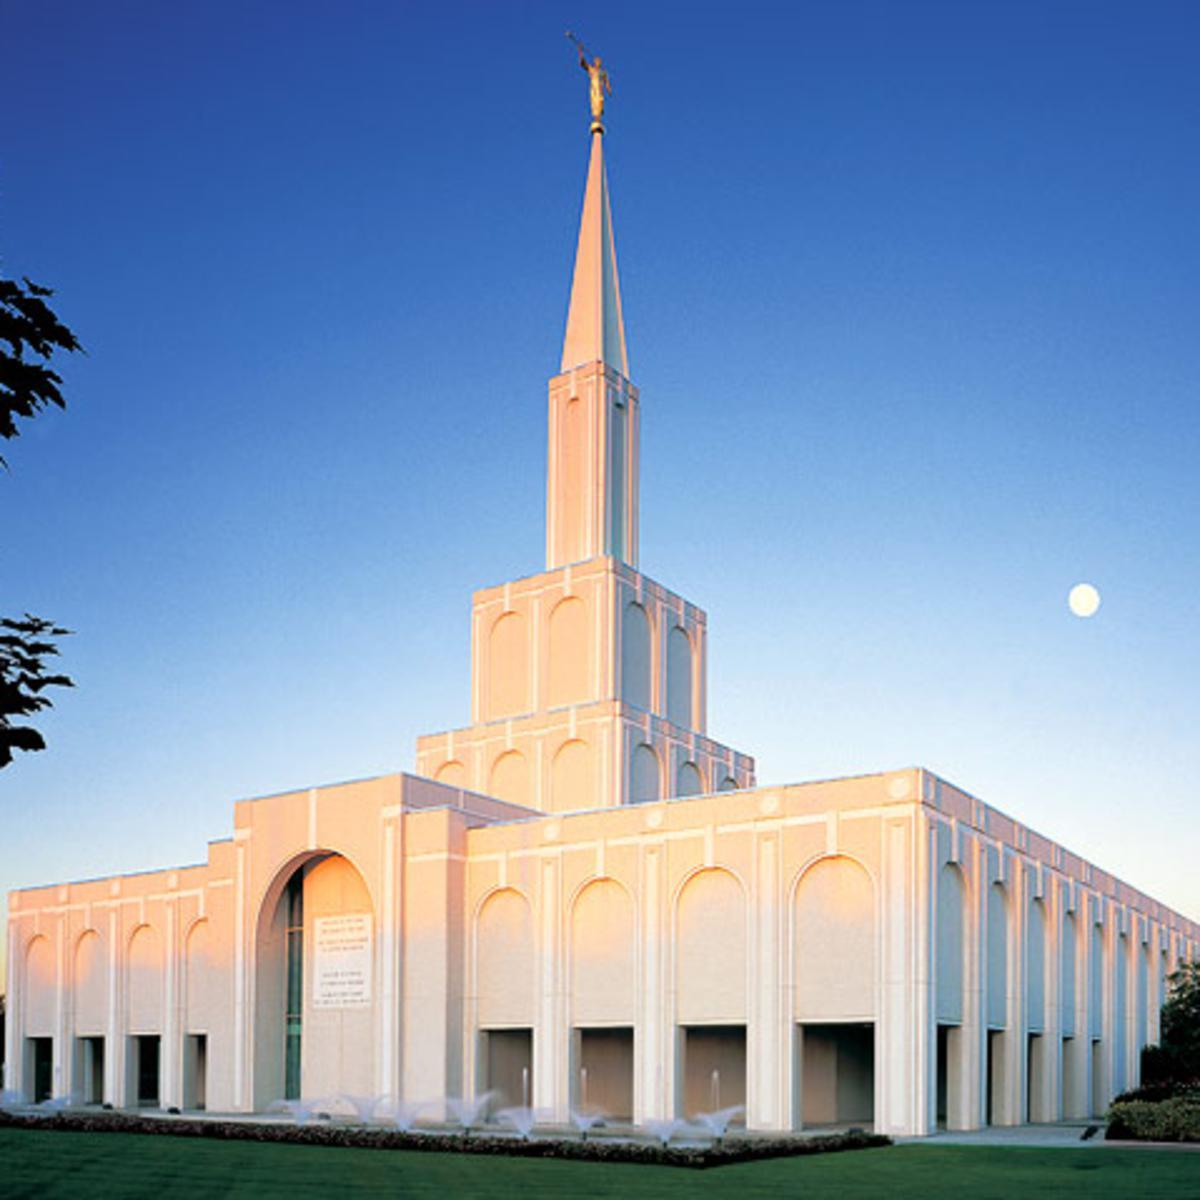 Image of the Toronto Ontario Mormon Temple